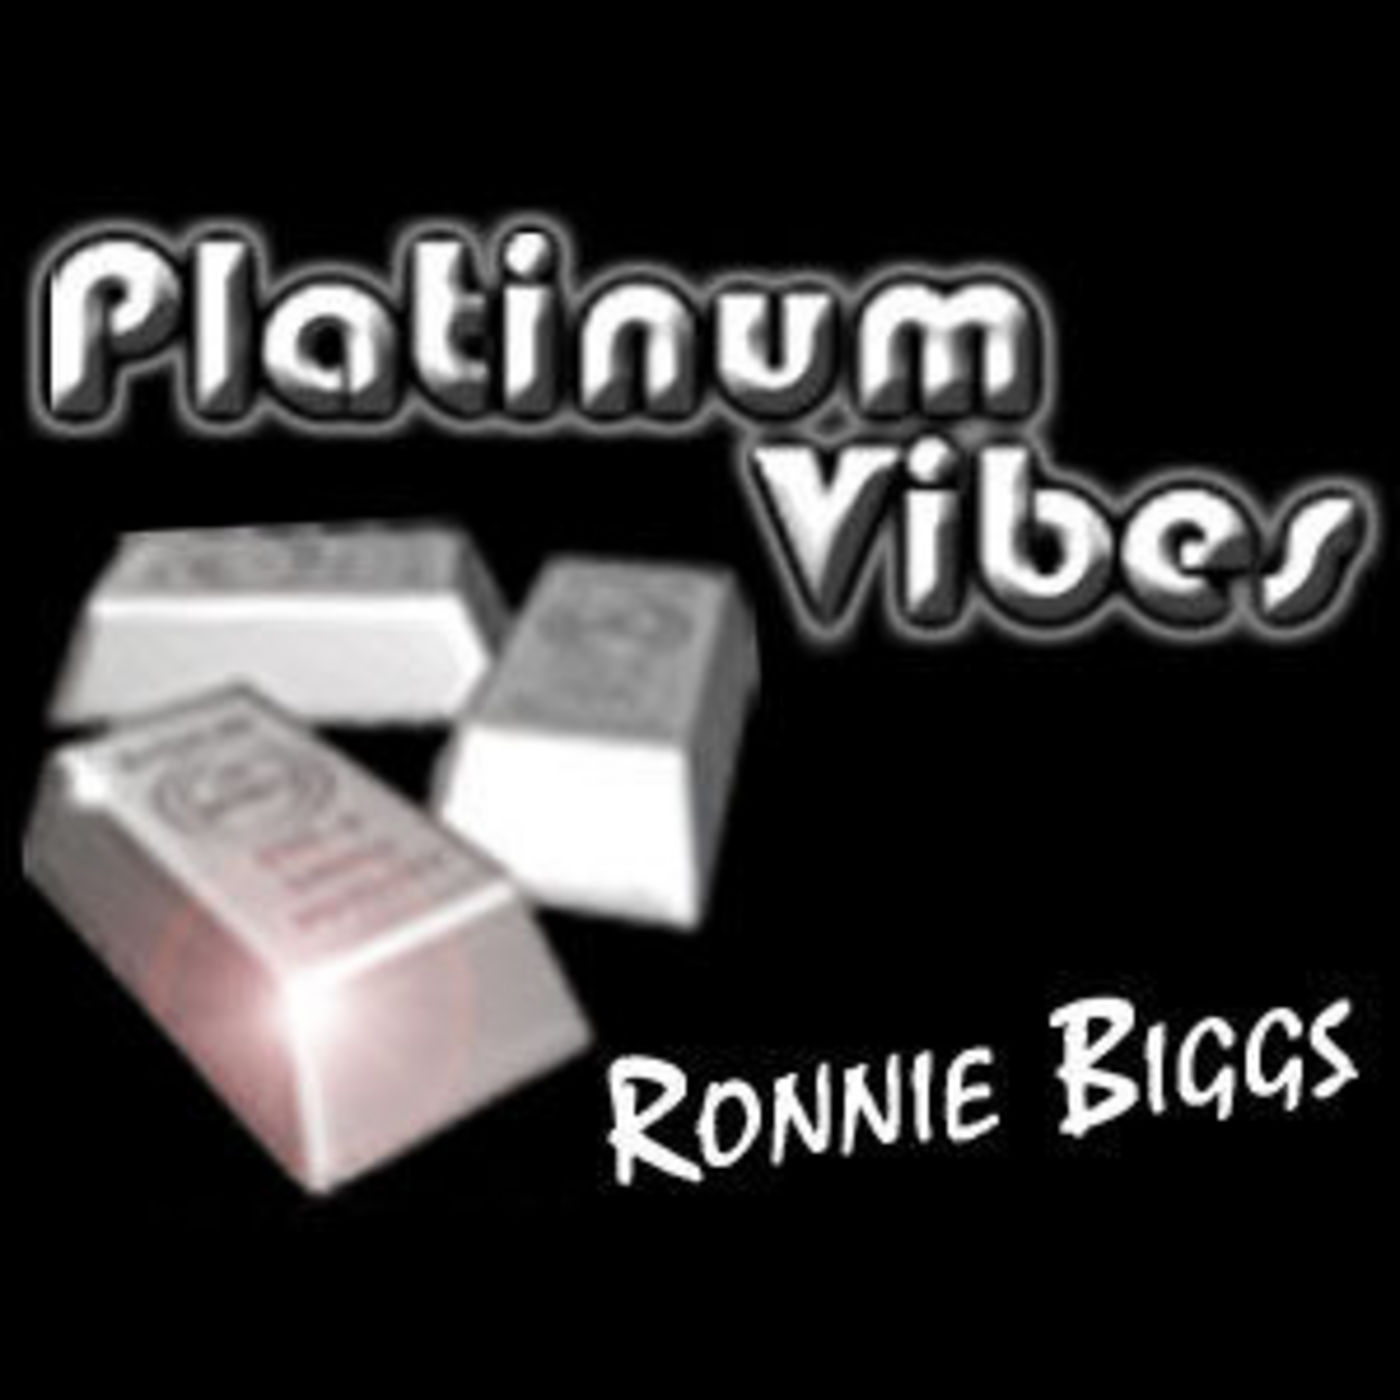 <![CDATA[Bigupradio.com PLATINUM VIBES Show]]>